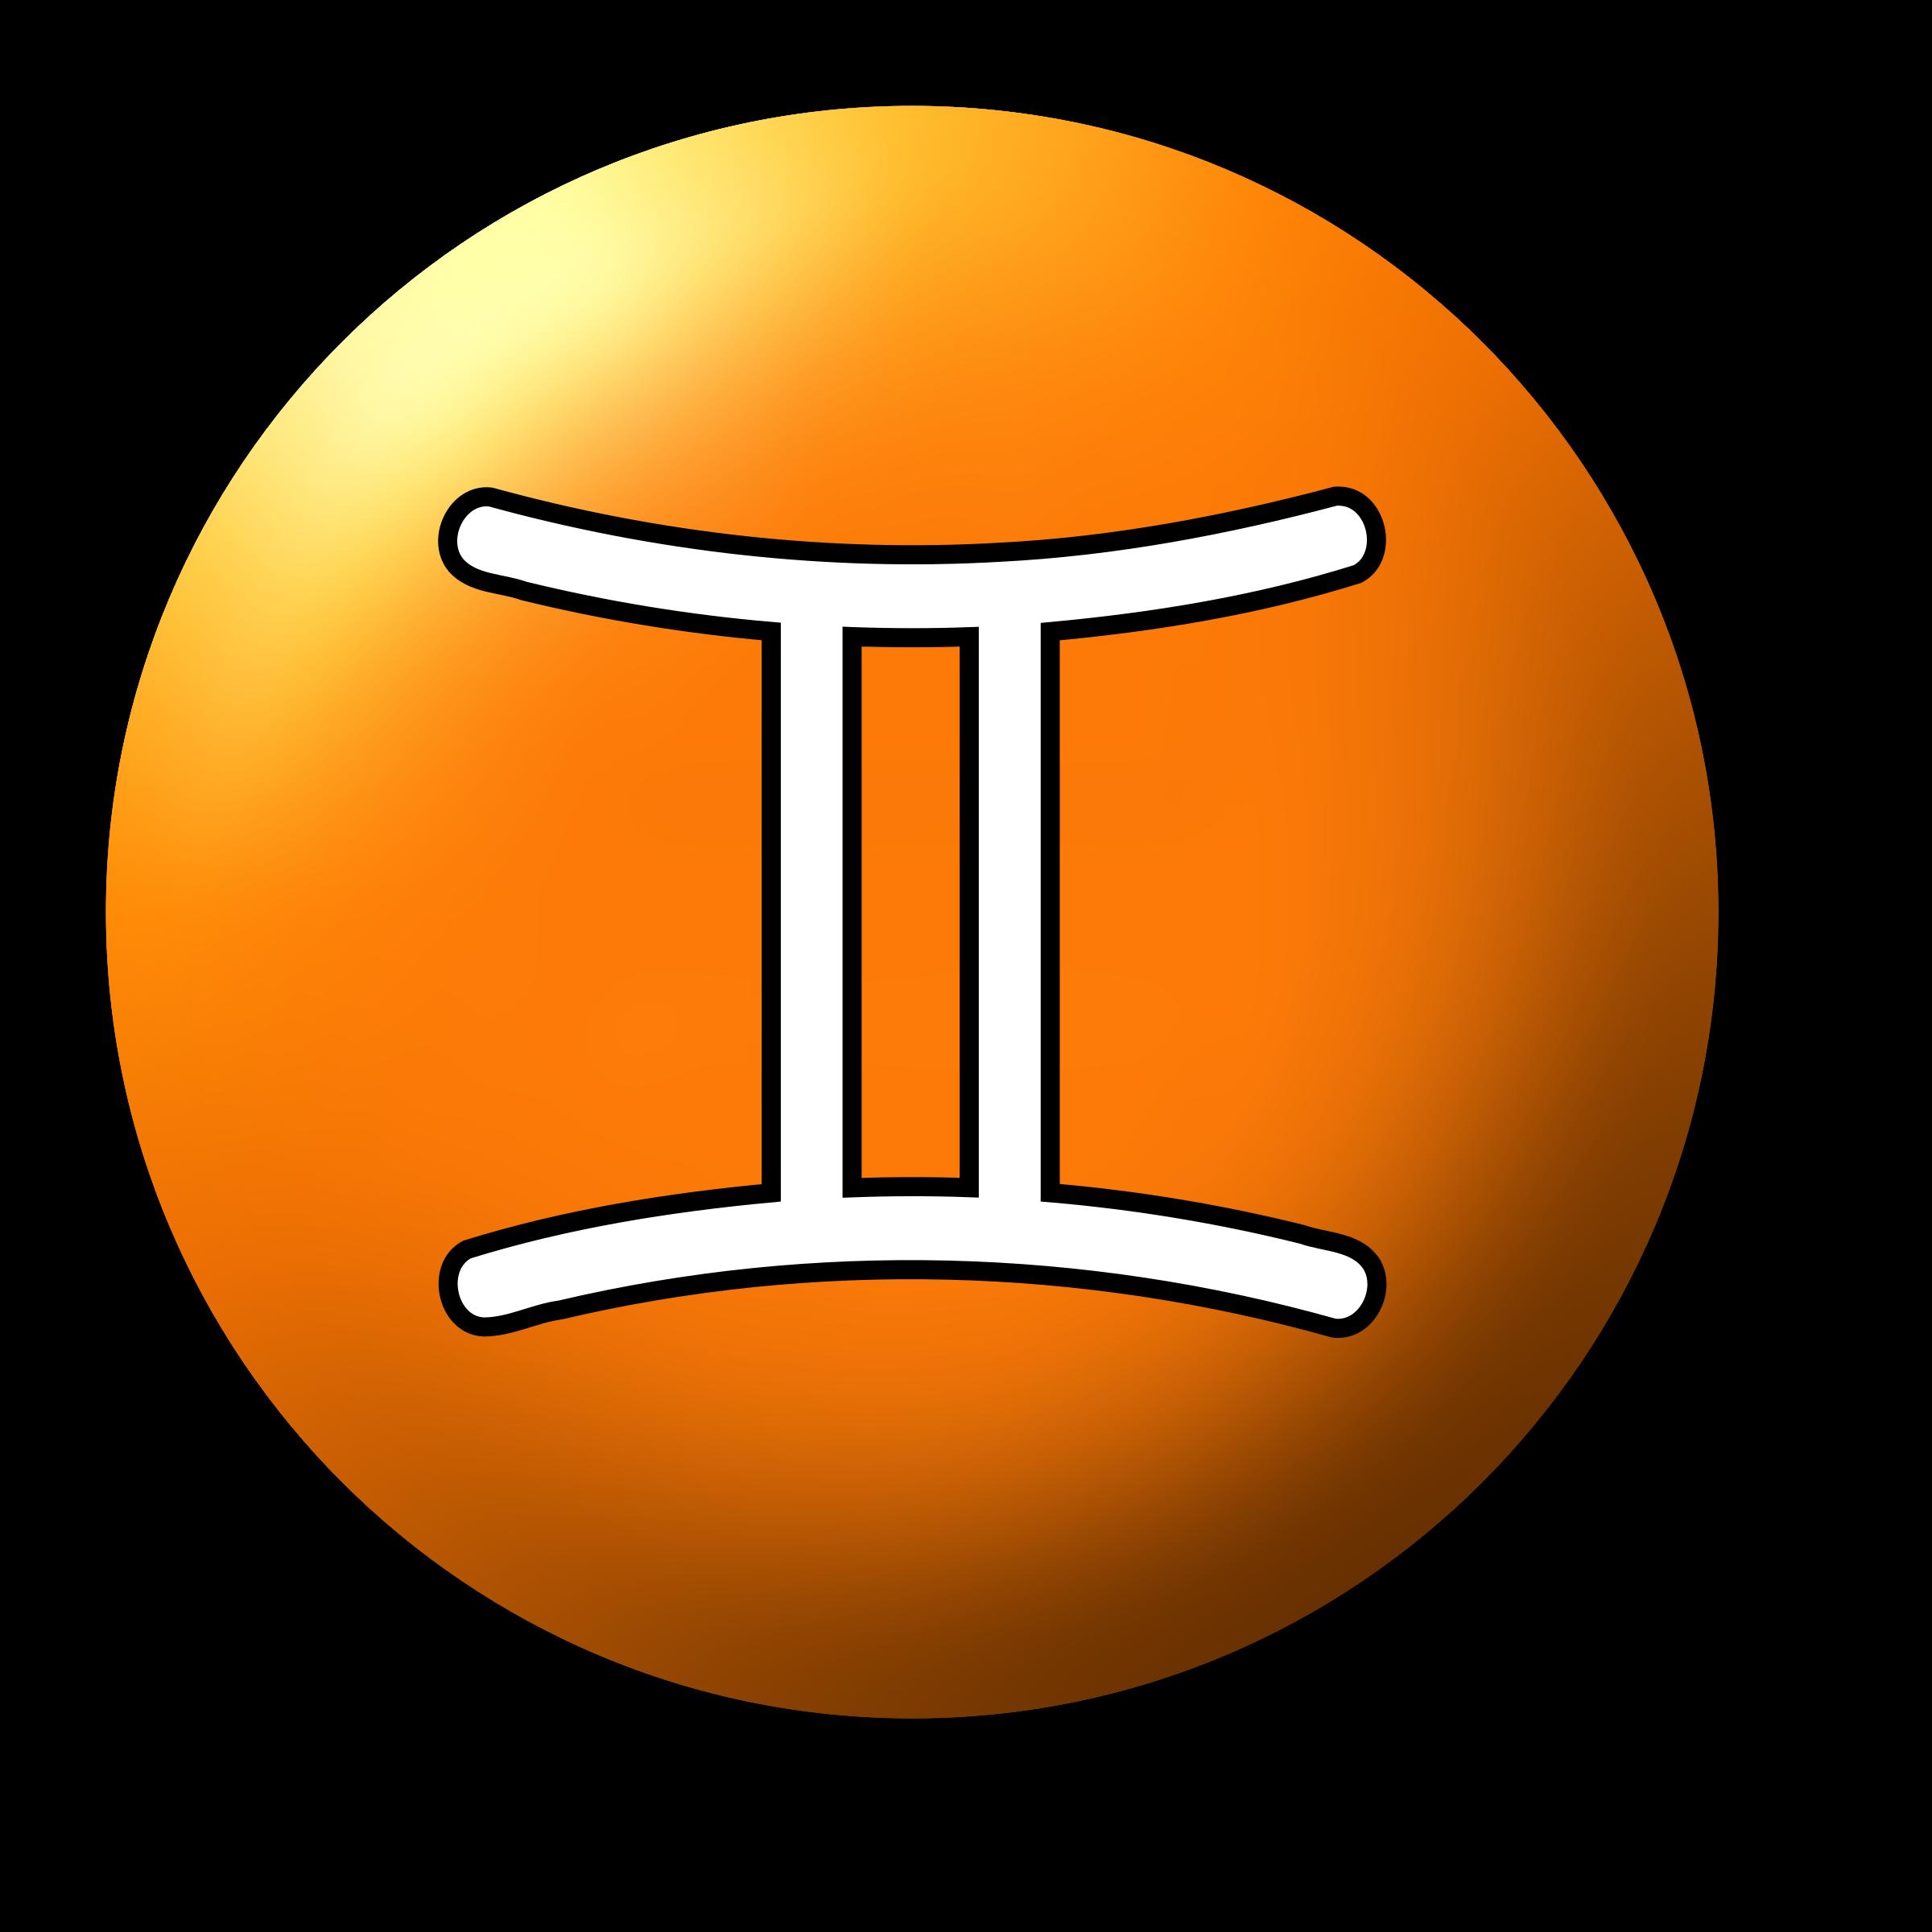 Gemini clipart symbol 3 symbol Gemini Clipart symbol